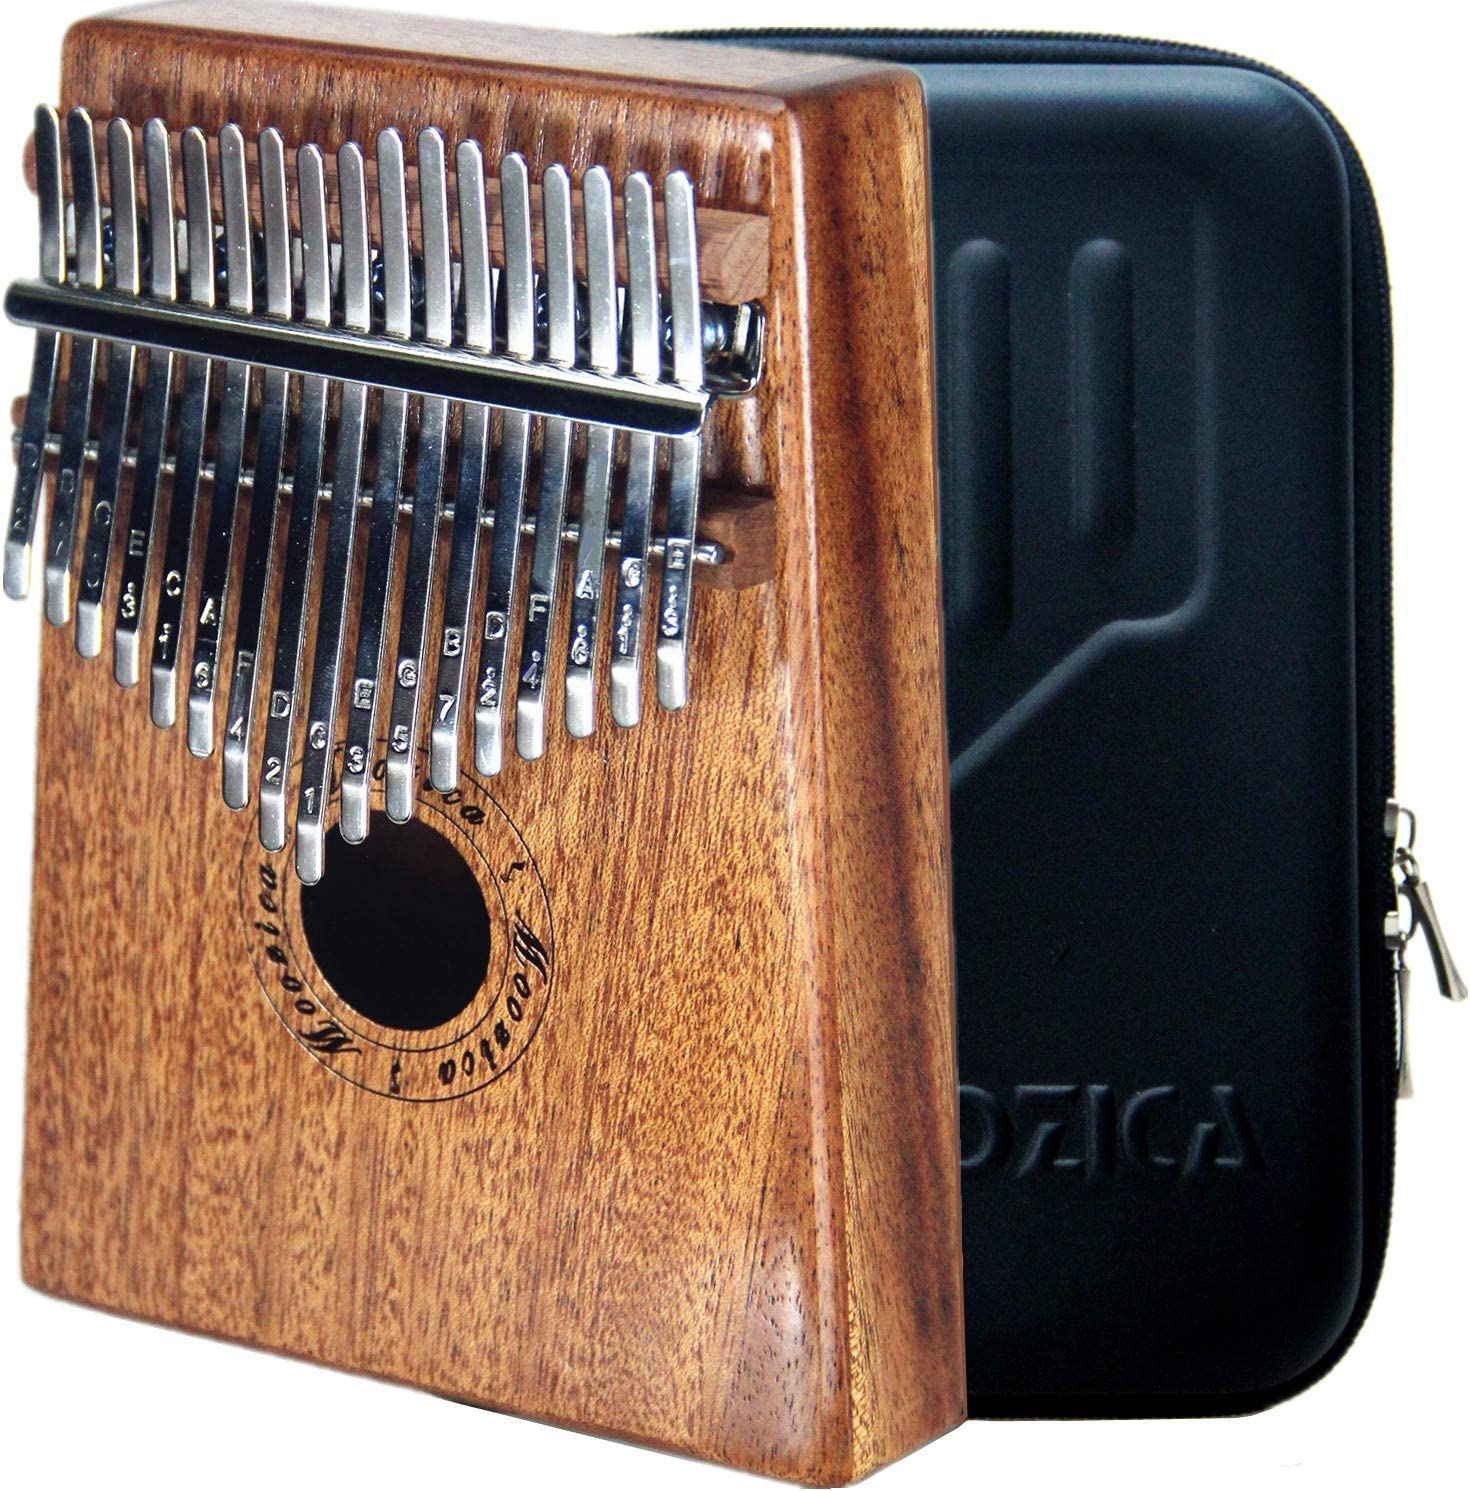 Acacia Koa, 21-Key Single Solid Wood Board Professional Kalimba Thumb Piano Marimba with Learning Instruction and High Performance Carrying Case MOOZICA 21 Keys Solid Koa Kalimba